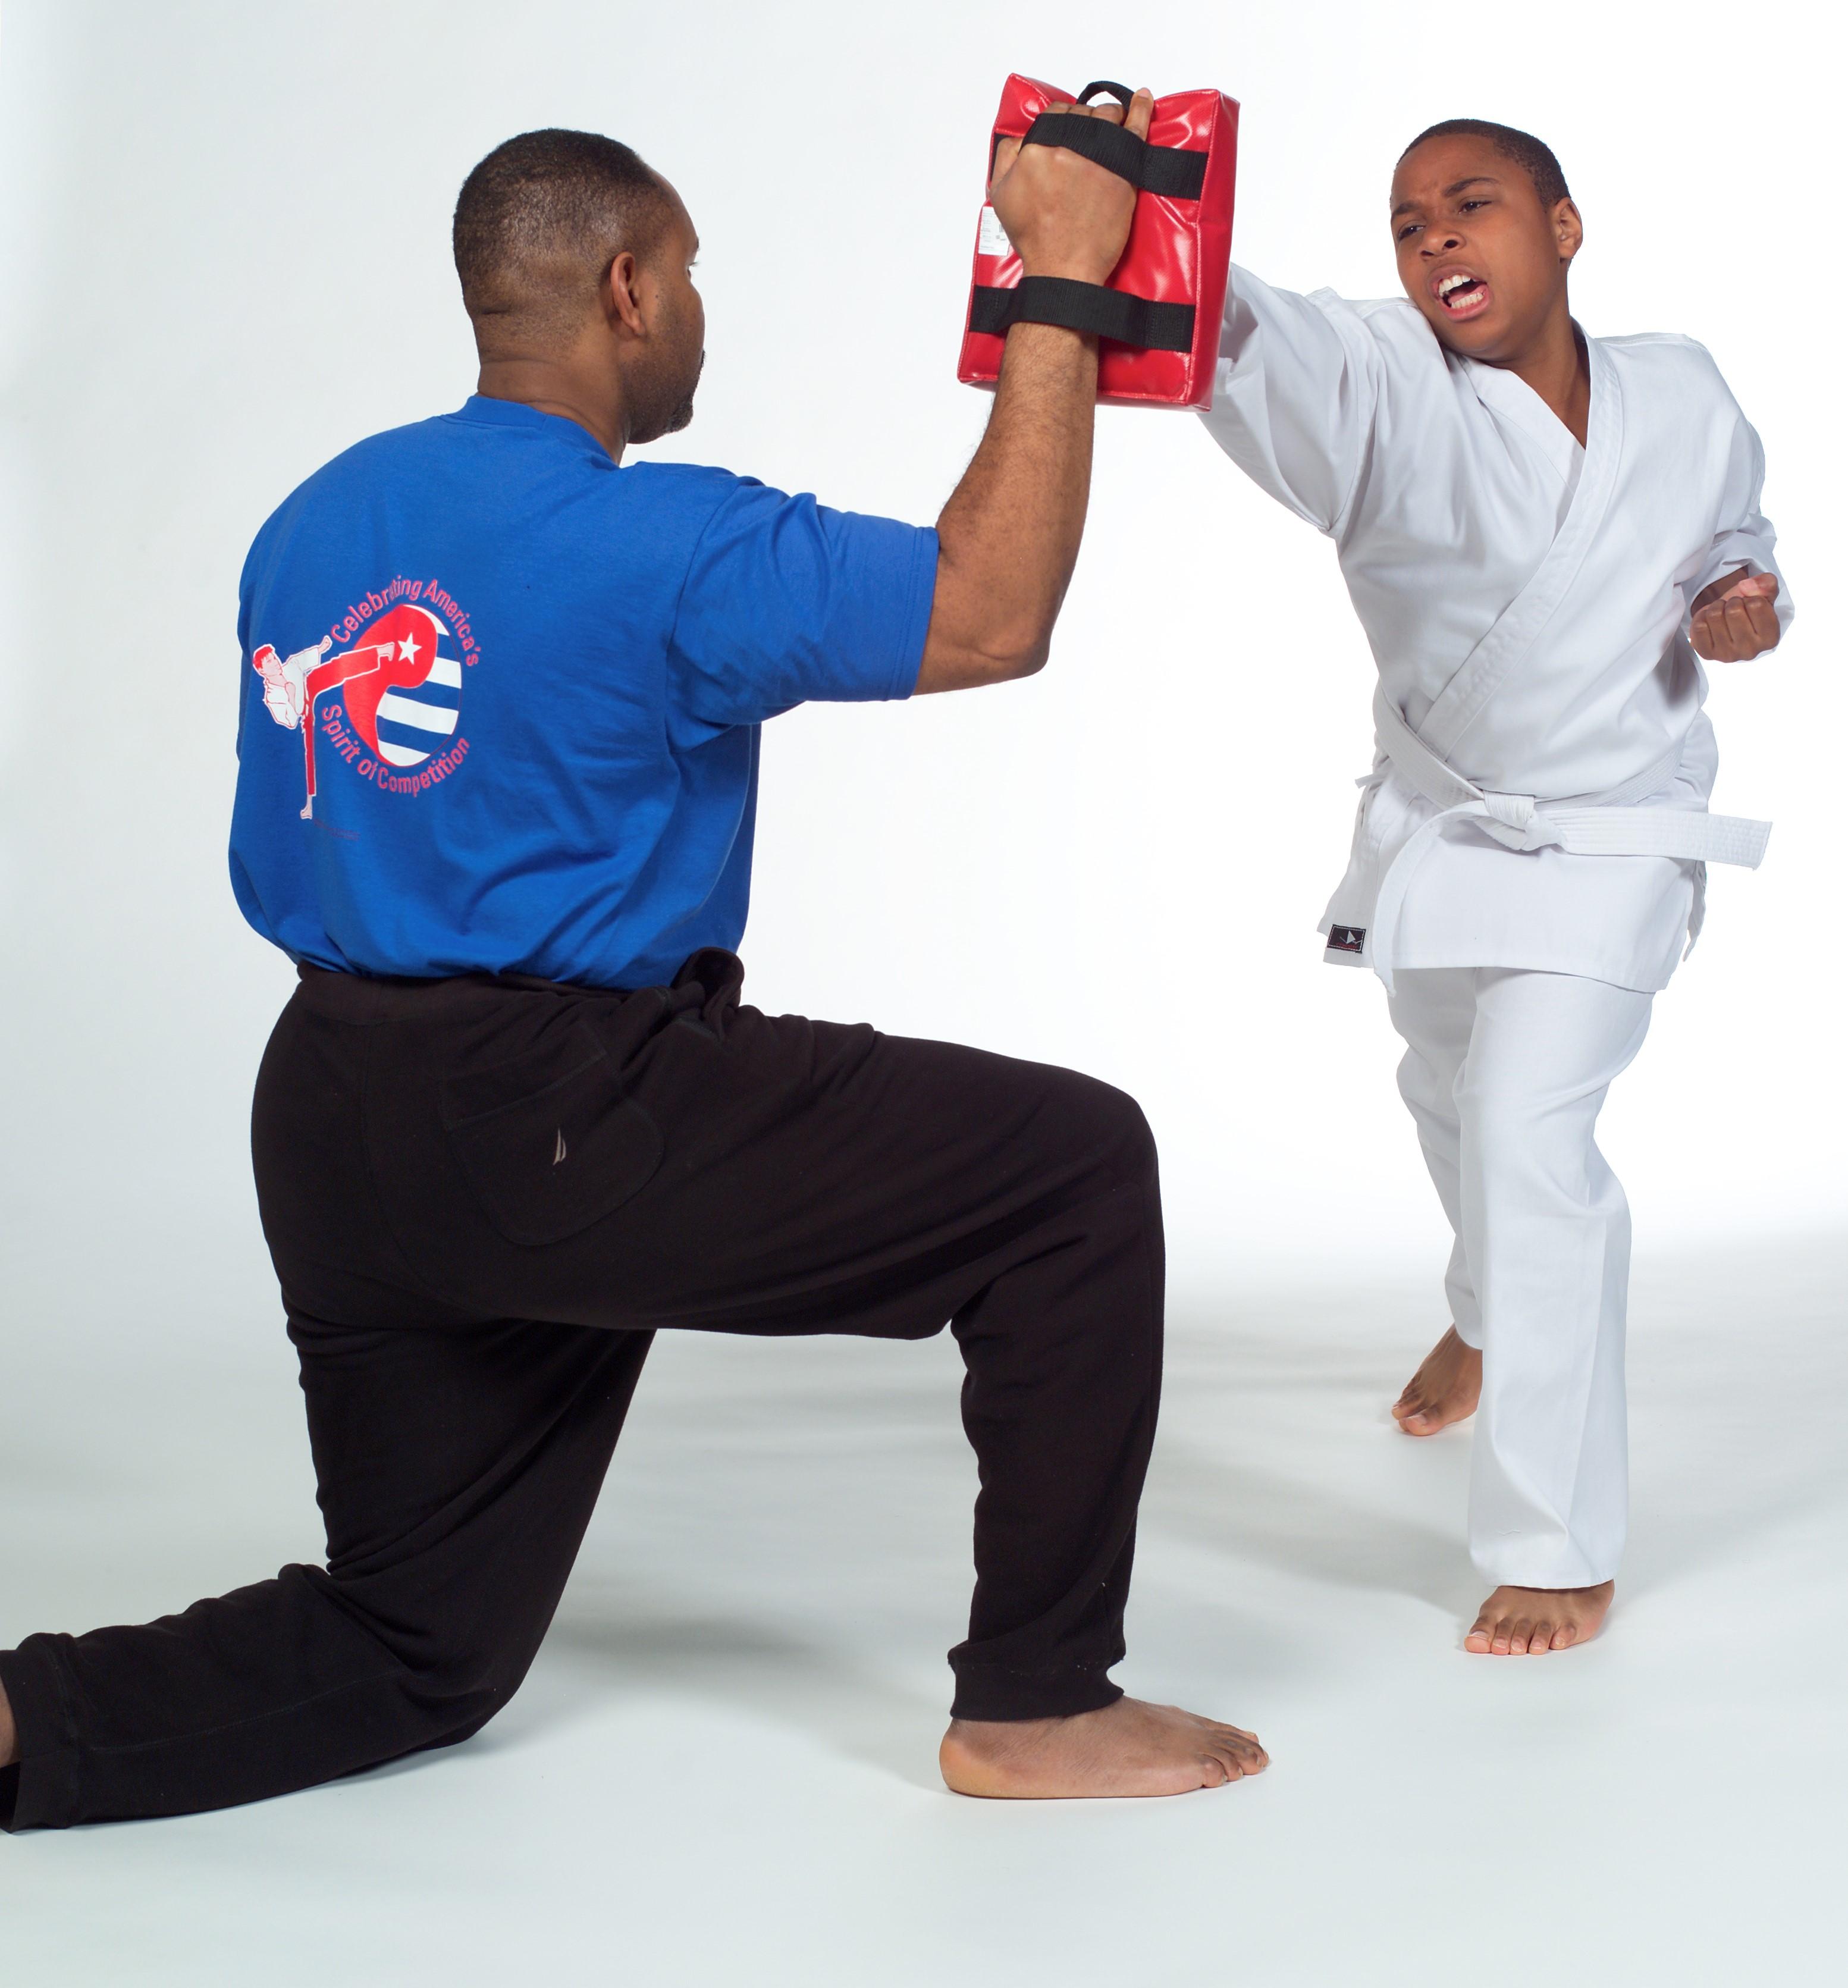 A father-son duo participate in a martial arts class.